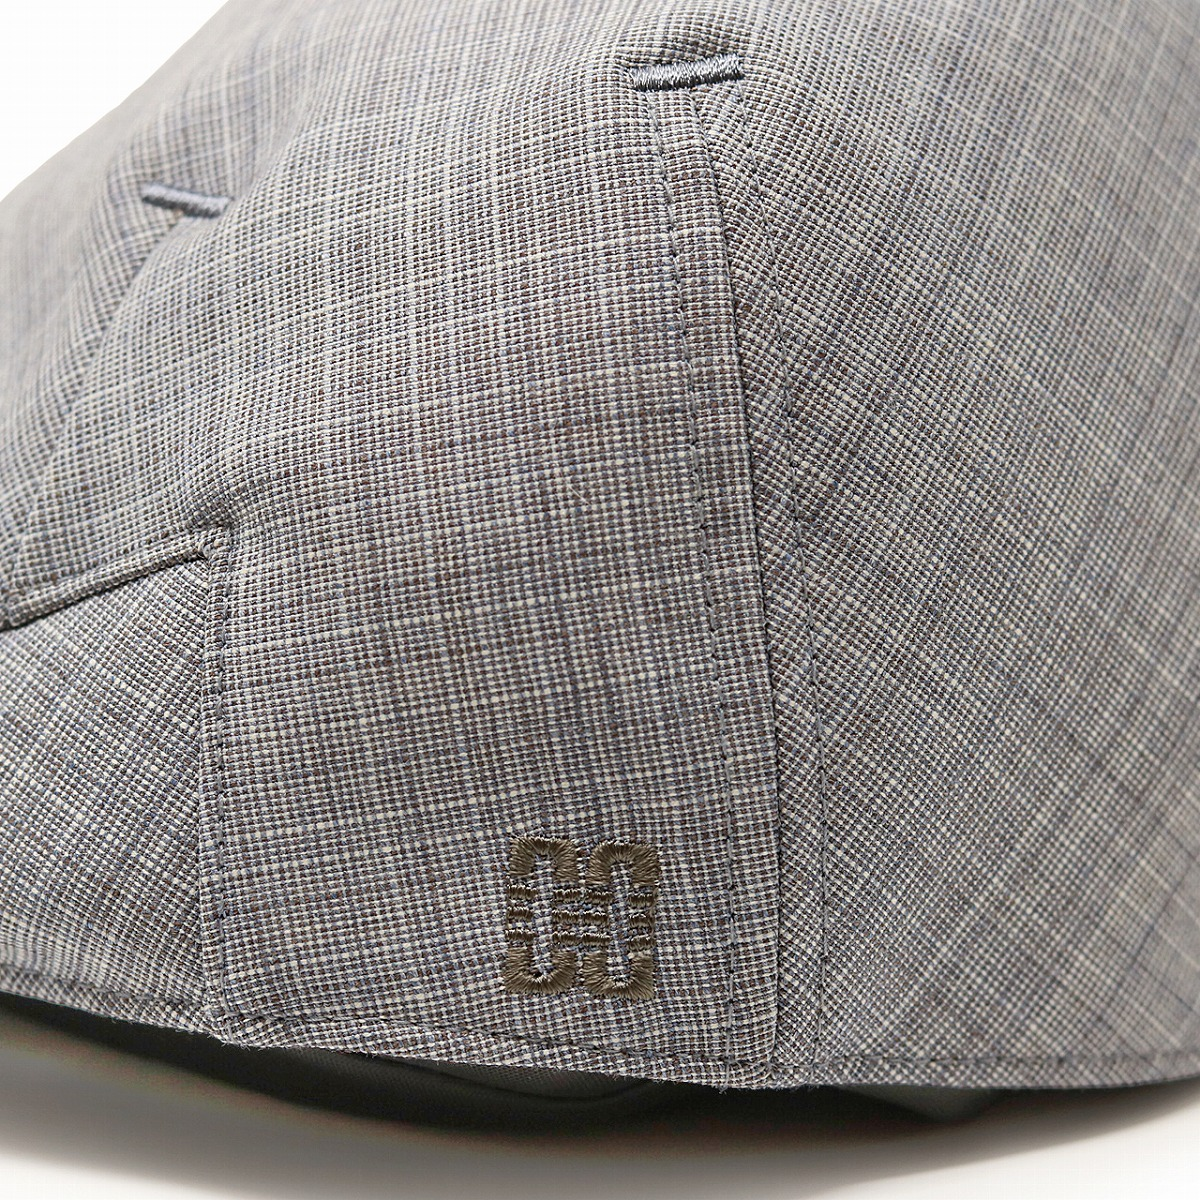 f19dd2ec676 It is a gift present in the size S M L LL hunting cap hat unisex Monaco  hunting cap U.K. brand   gray  ivy cap  Father s Day when Shin pull plain  fabric ...